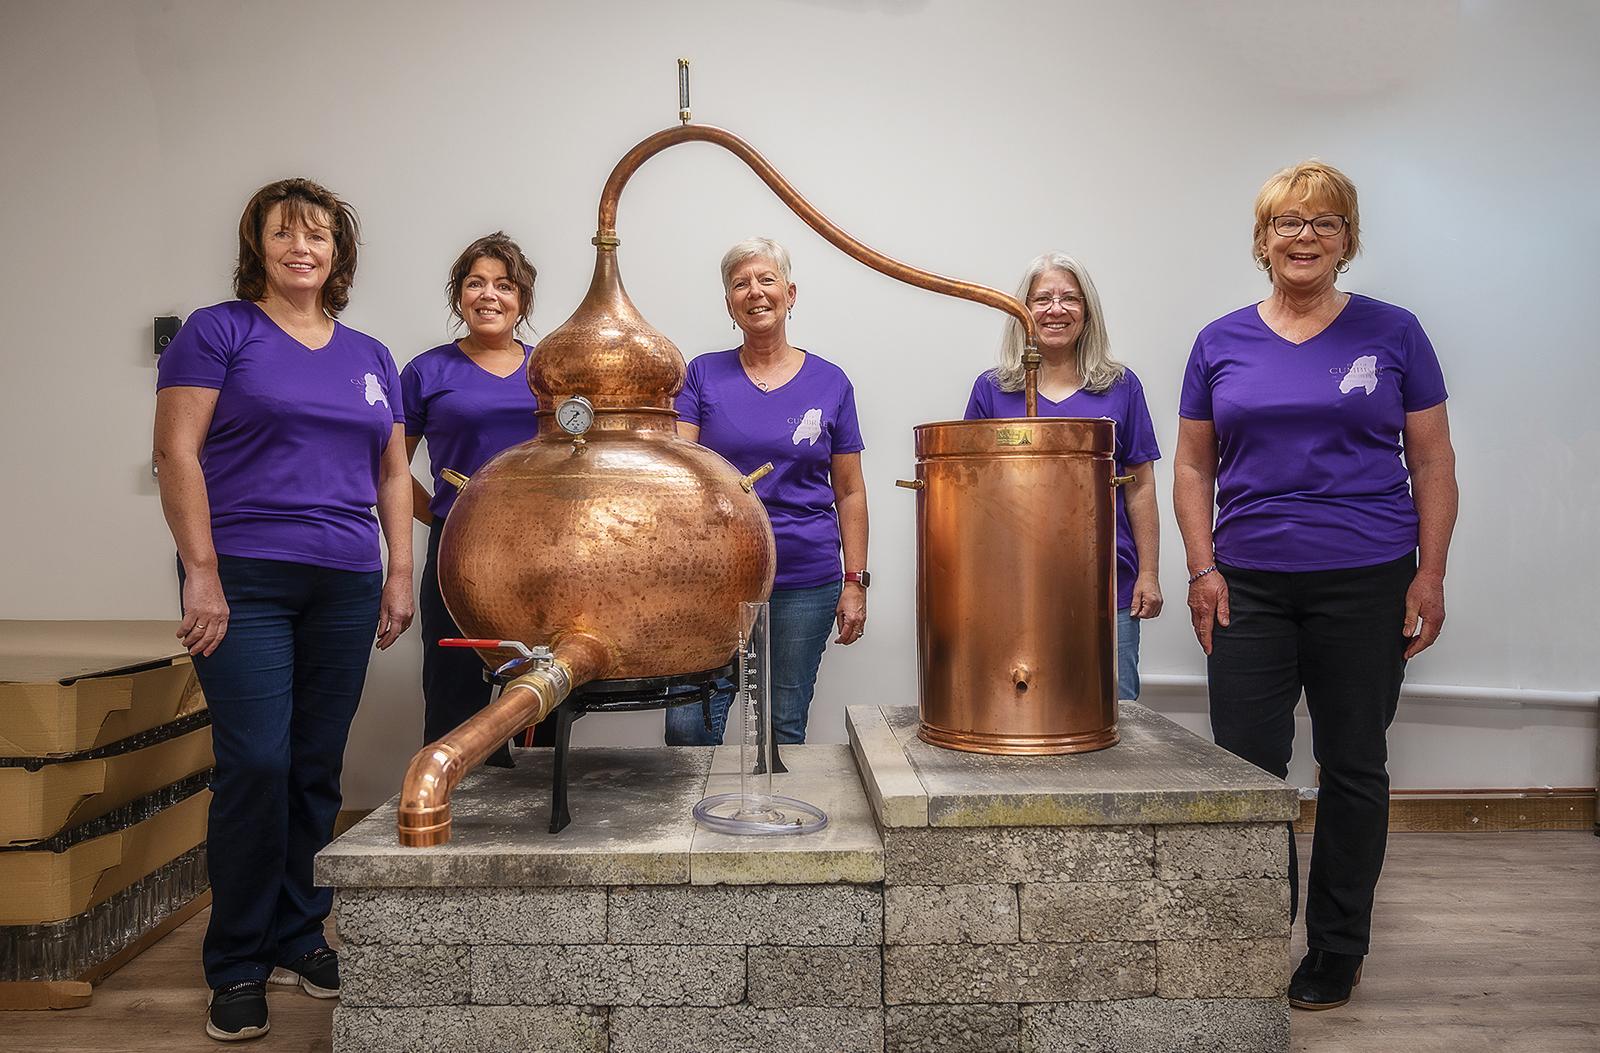 Isle of Cumbrae Distillers team